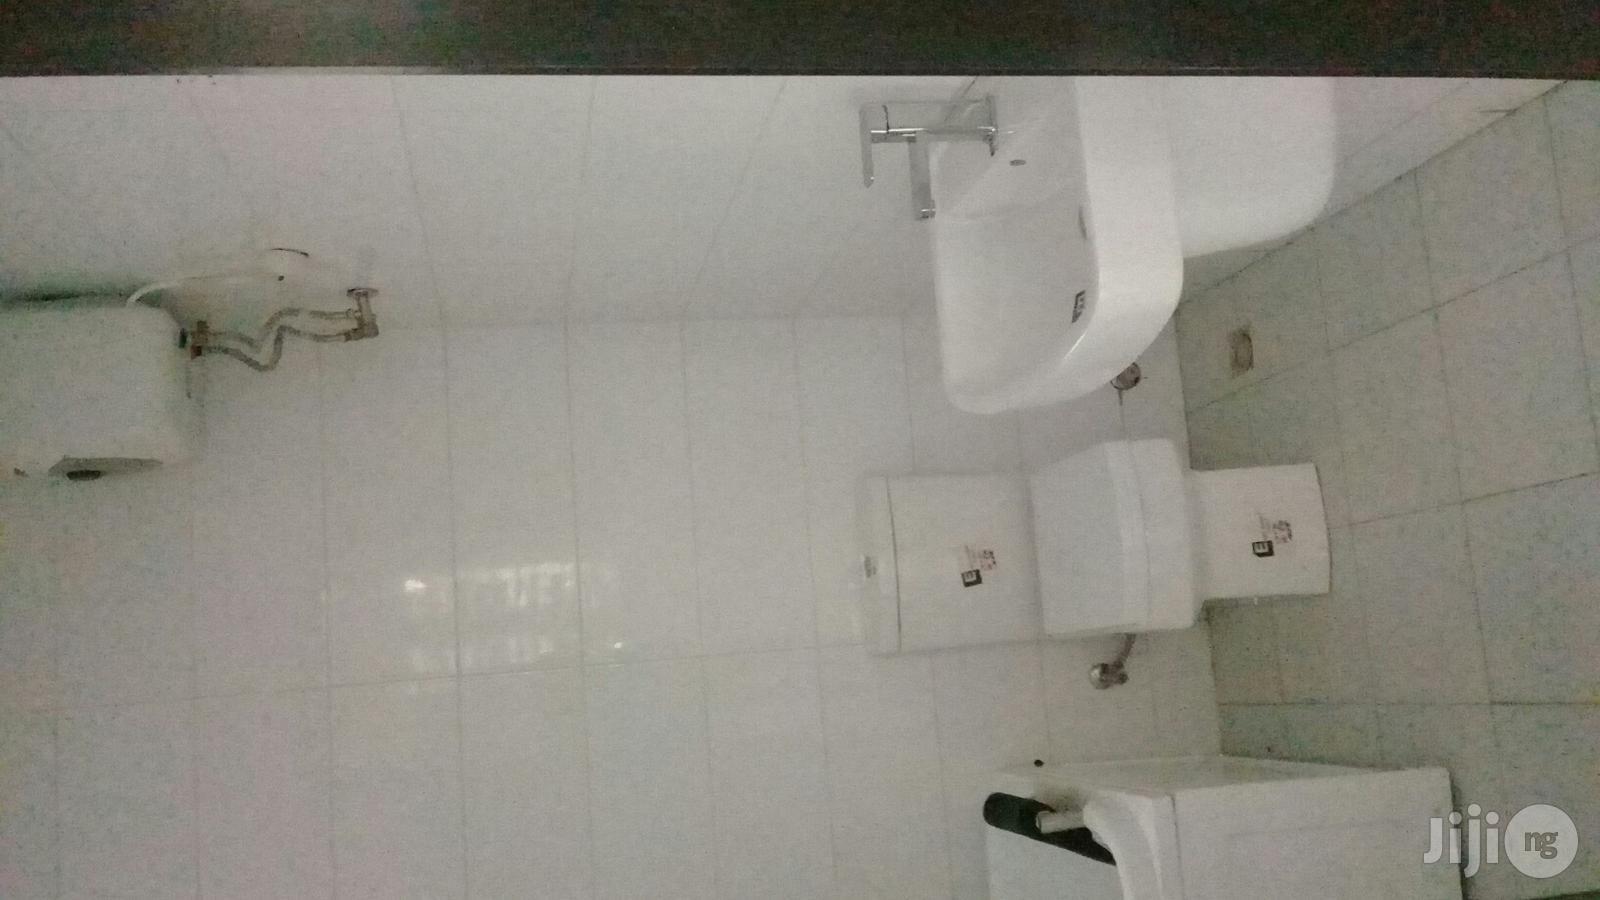 4 Bedroom Duplex for Sale in Lekki Phase 1. | Houses & Apartments For Sale for sale in Lekki, Lagos State, Nigeria